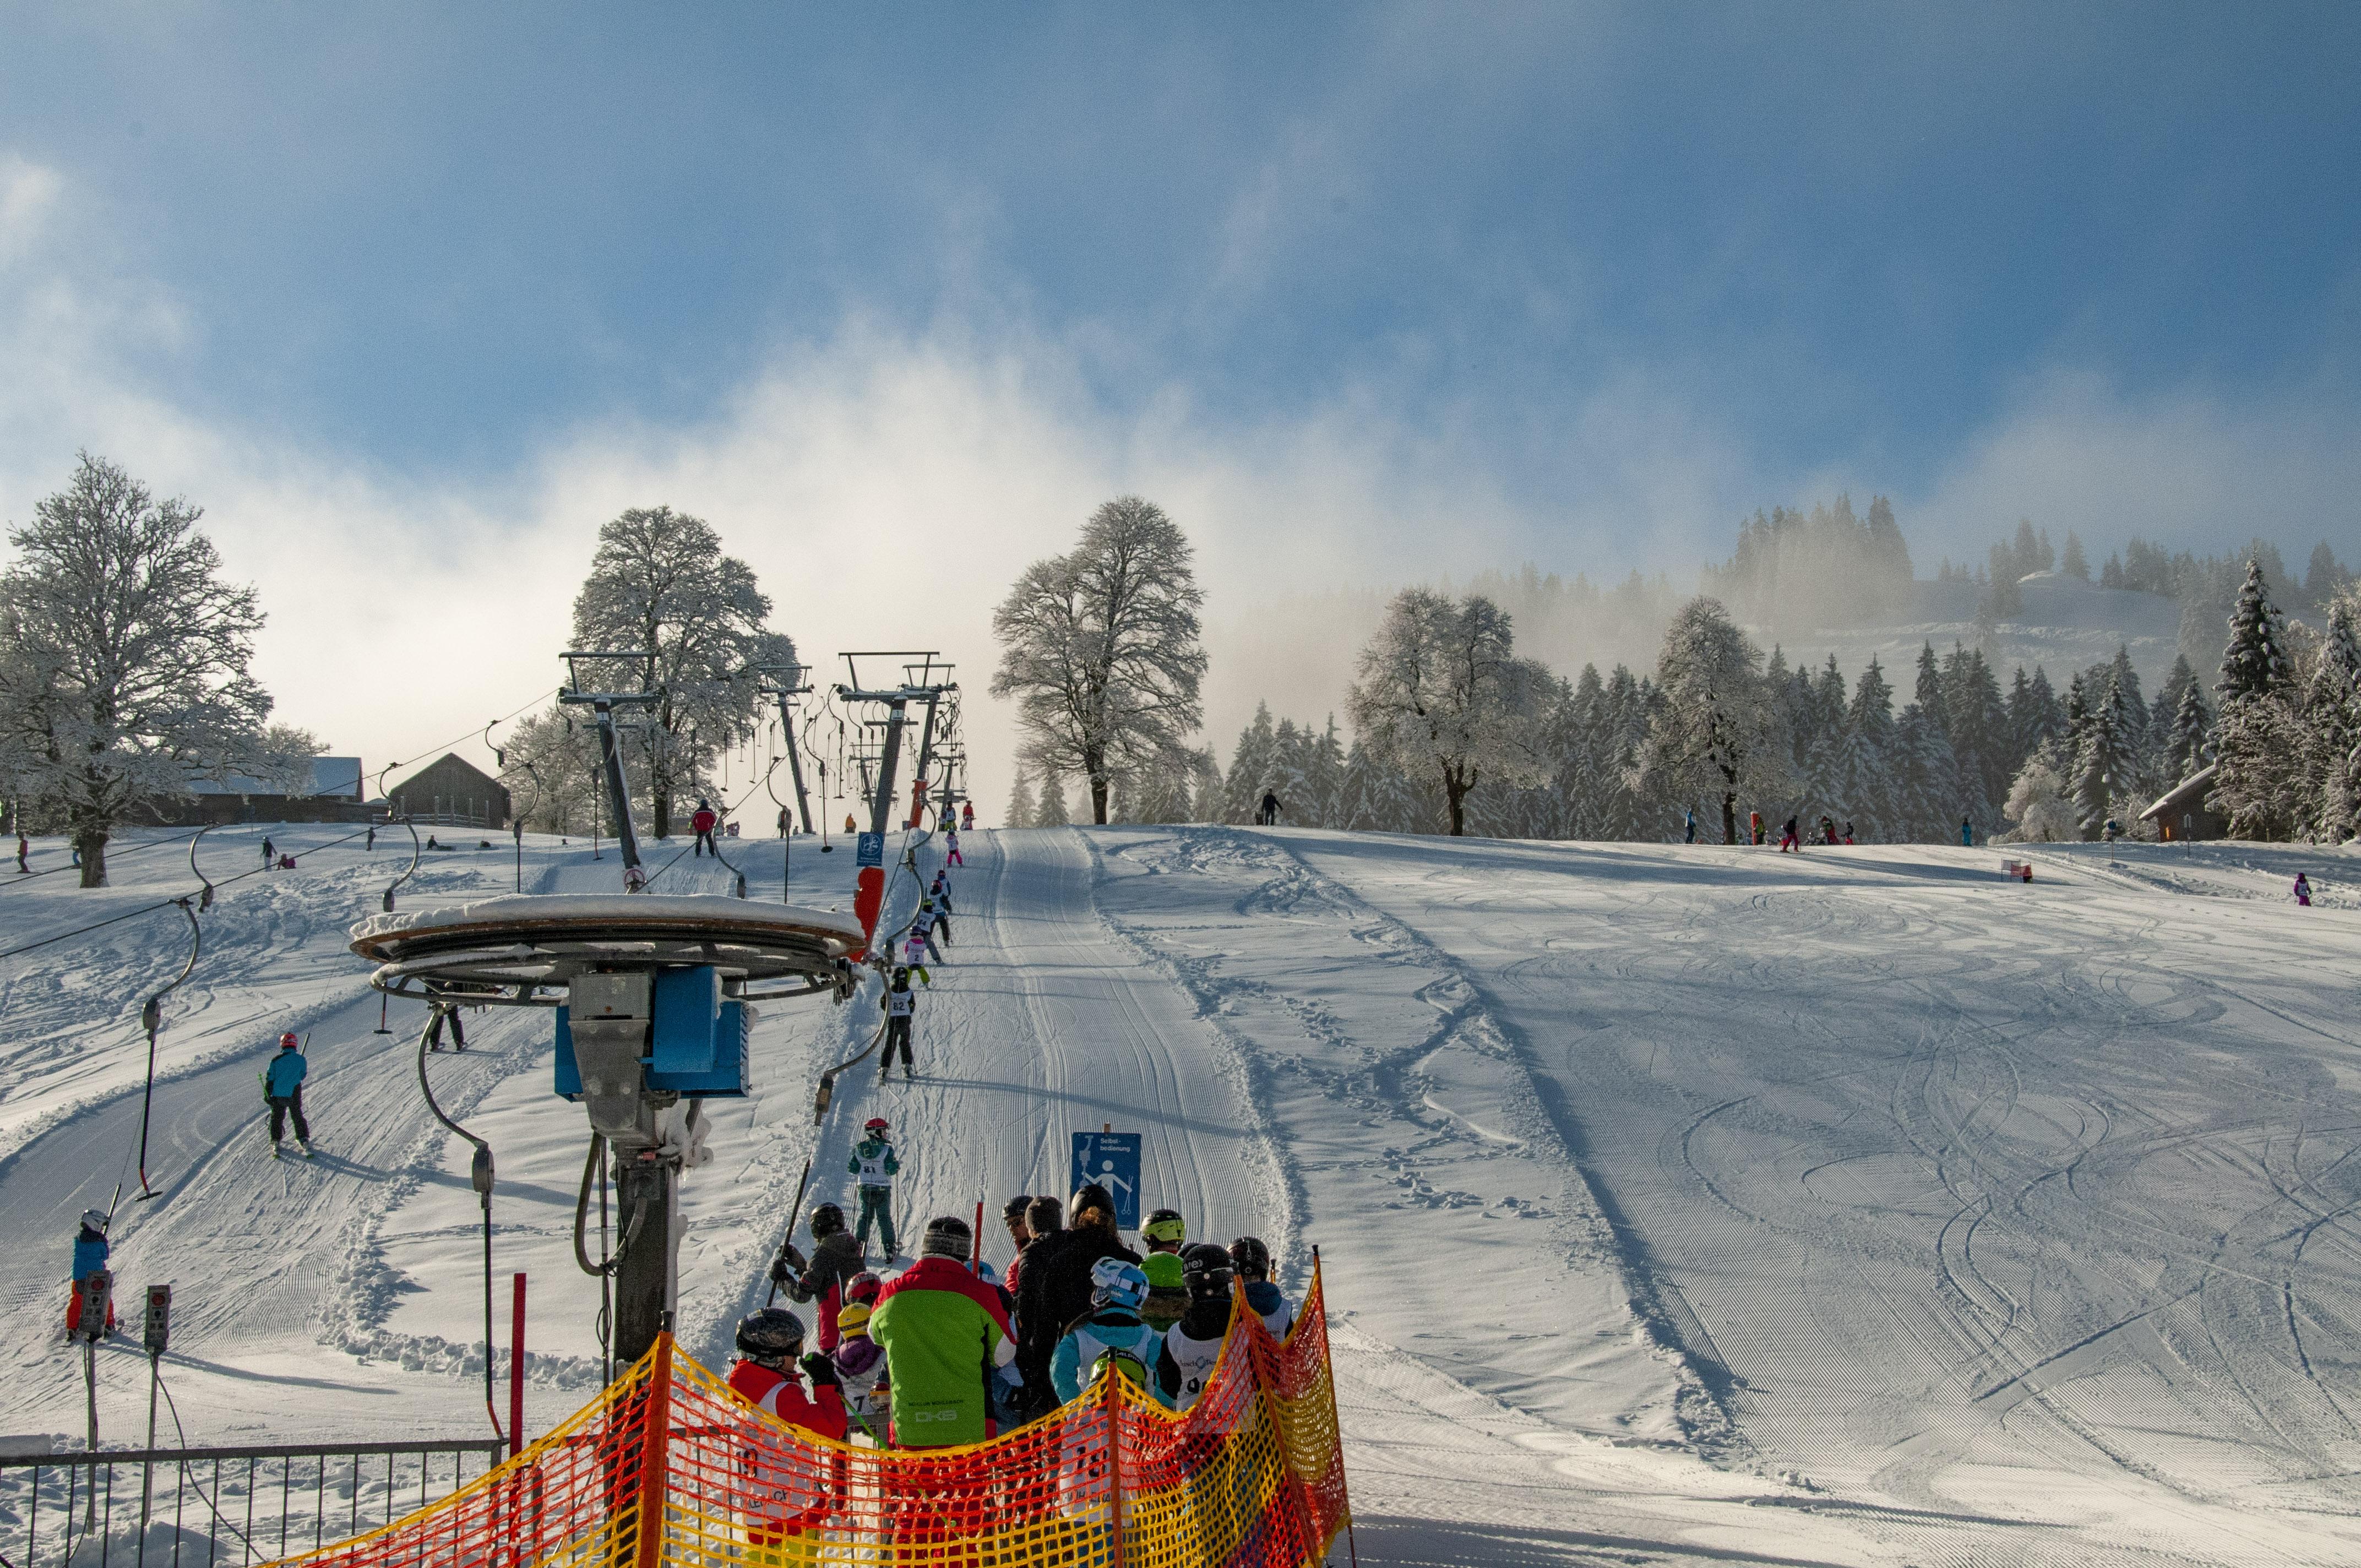 Skigebiet Bödele, Oberlosen Tal / Copyright© Jürgen Kostelac, Tarifgemeinschaft Bödele